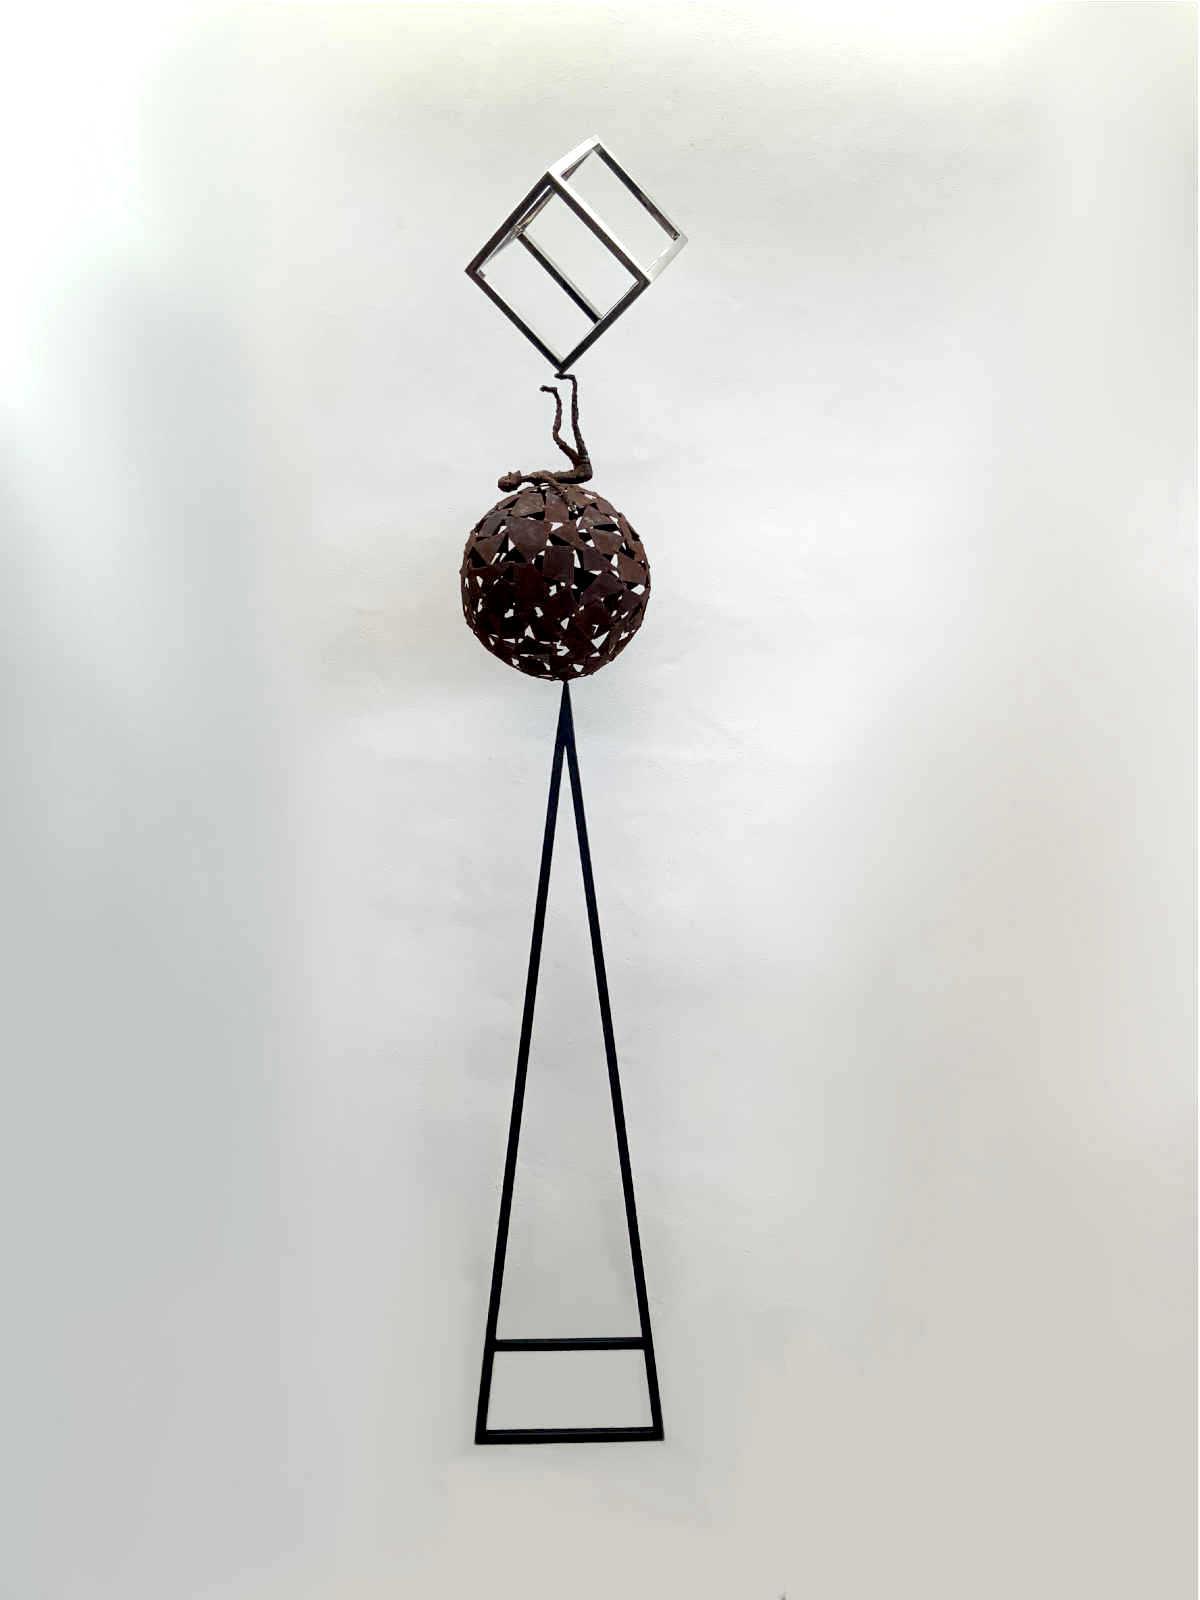 escultura acero corten inoxidable tenerife